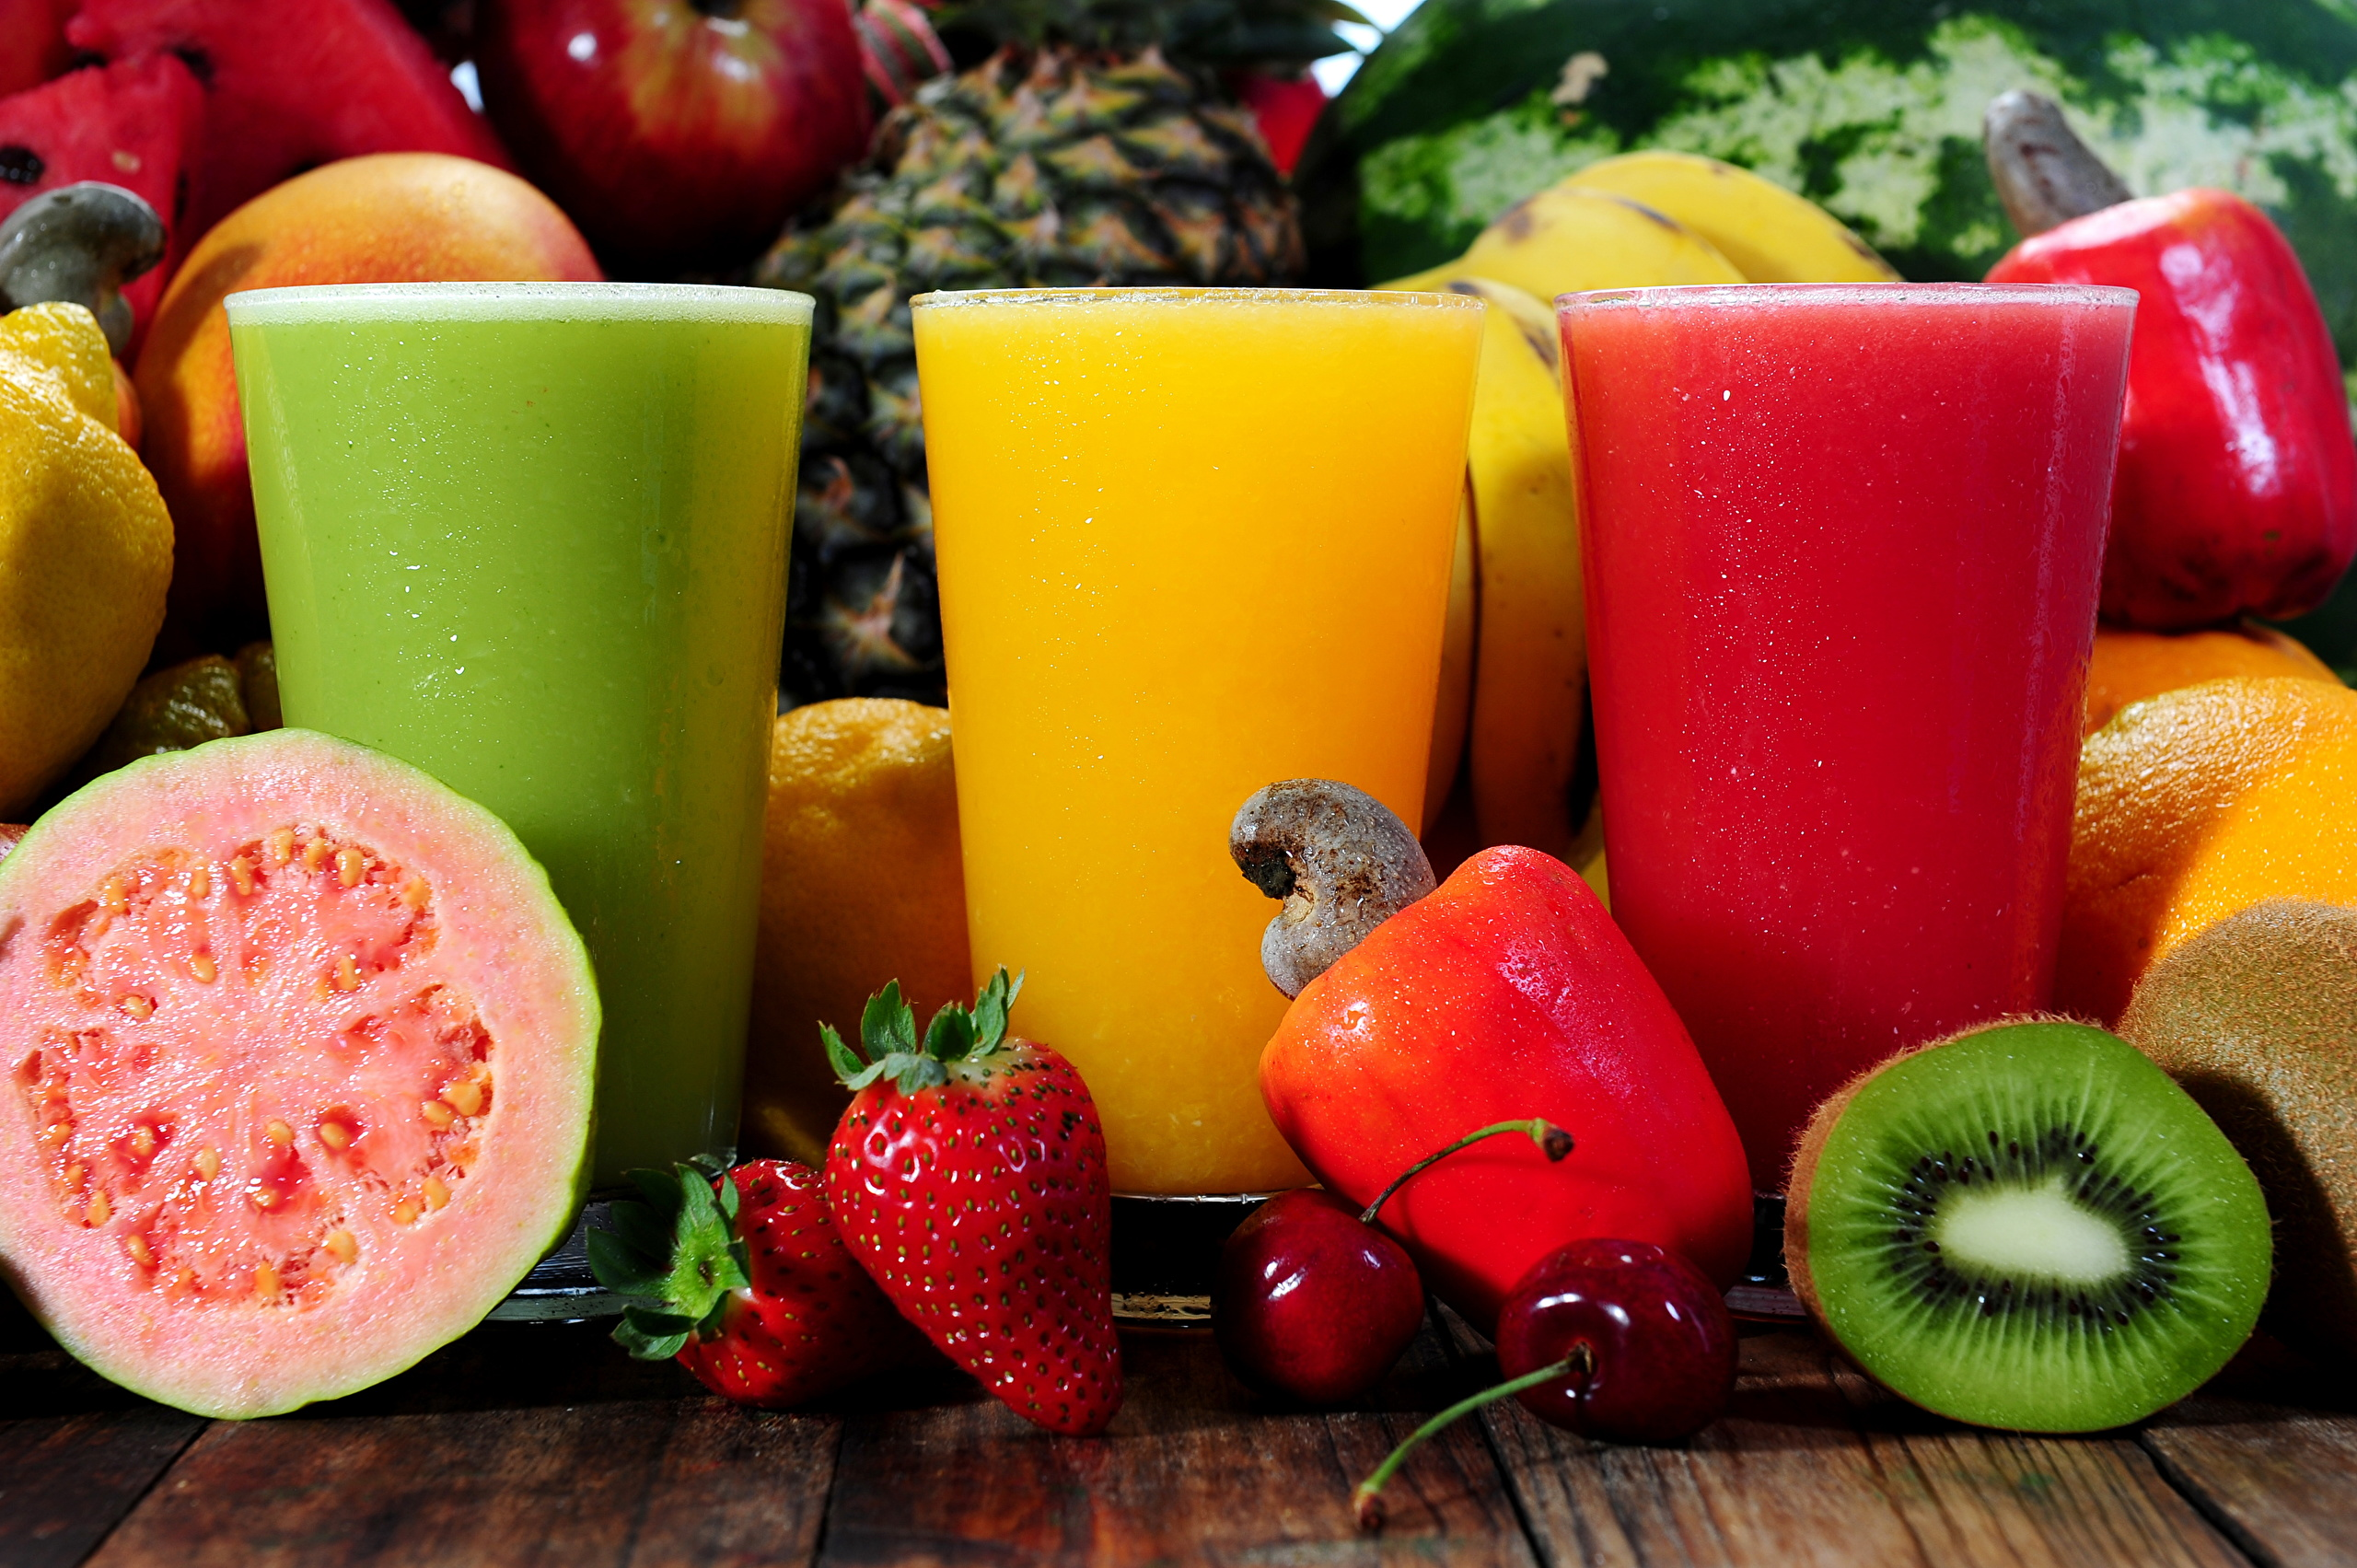 marketing analysis berri pure fruit juice